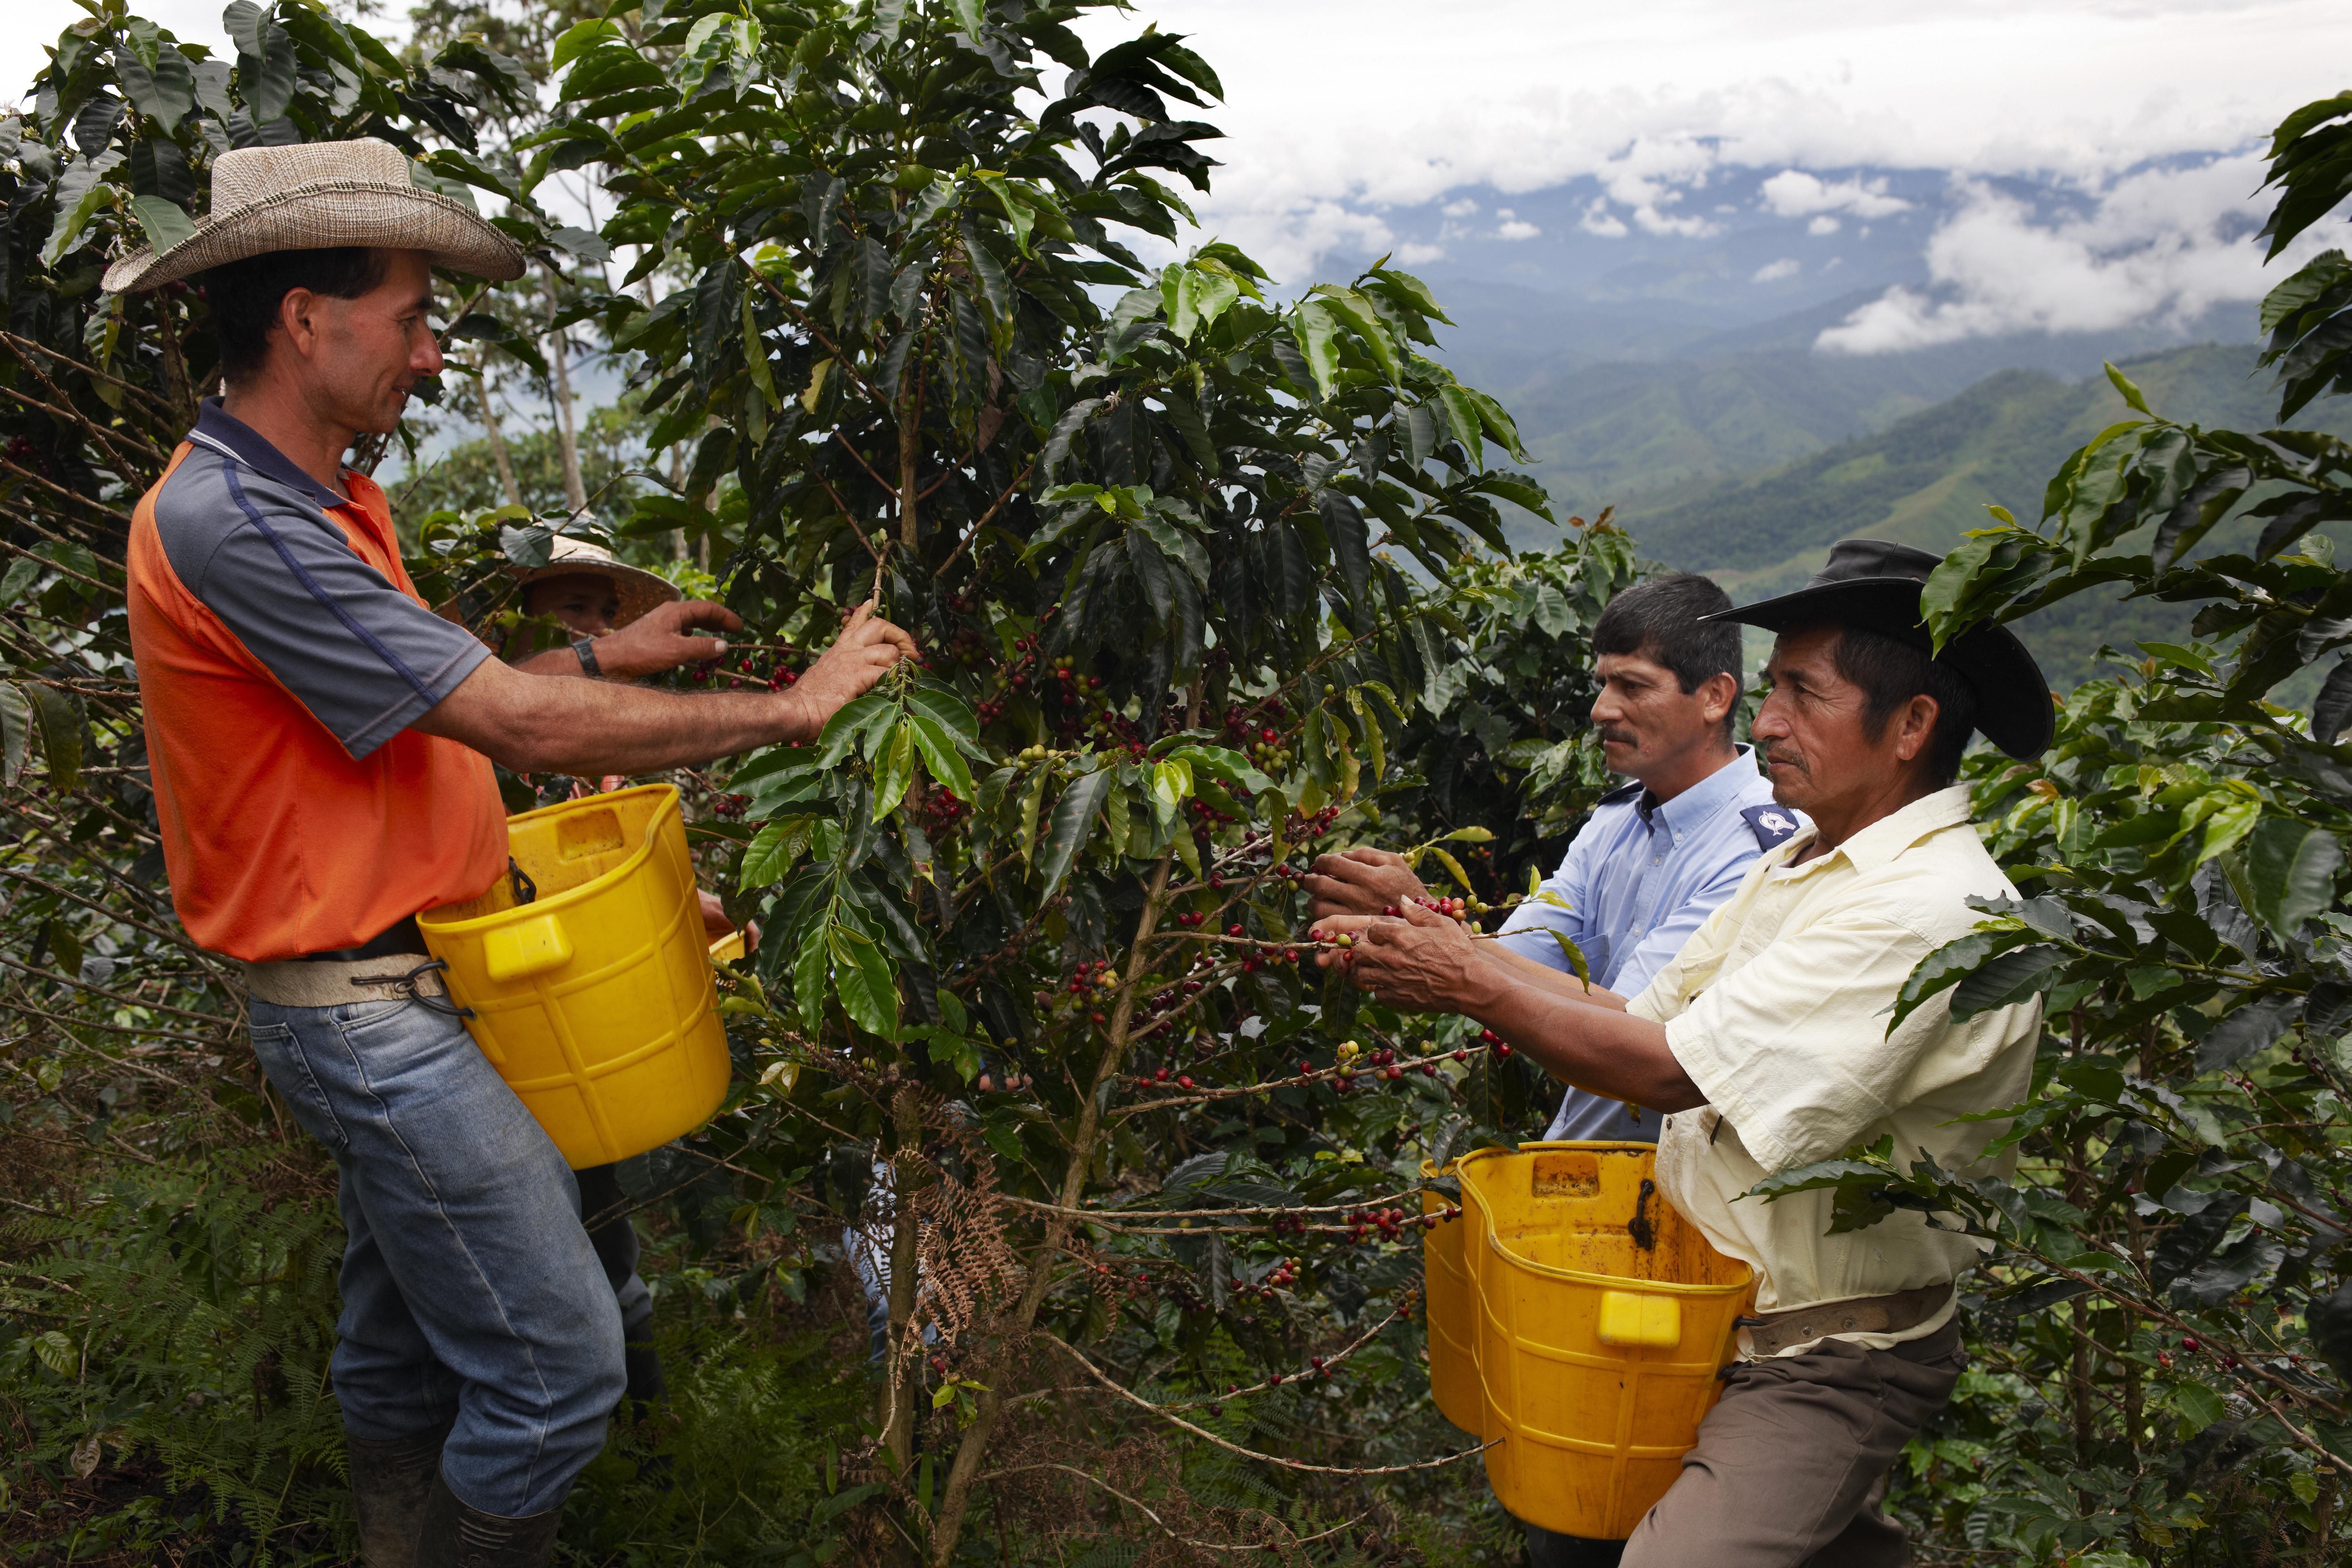 Farm workers picking coffee cherries on Rainforest Alliance Certified farm.